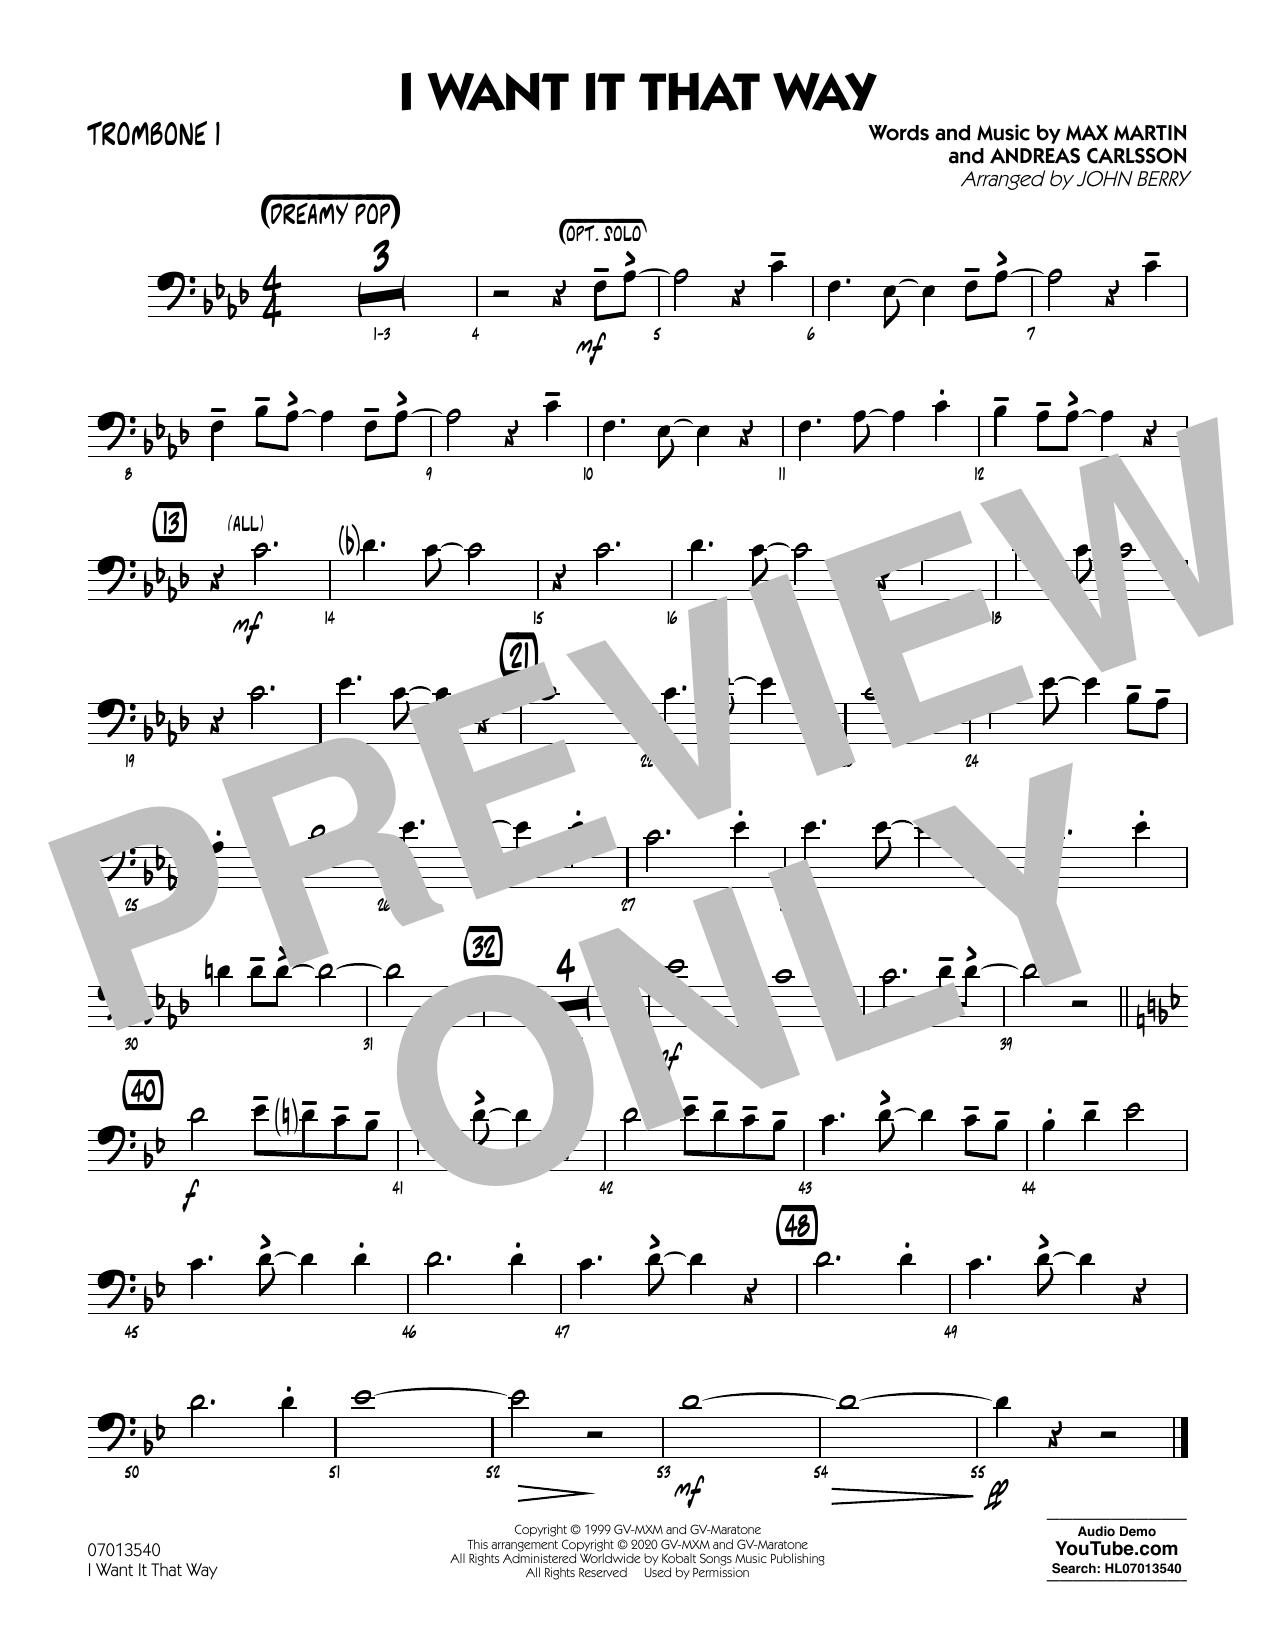 I Want It That Way (arr. John Berry) - Trombone 1 Sheet Music